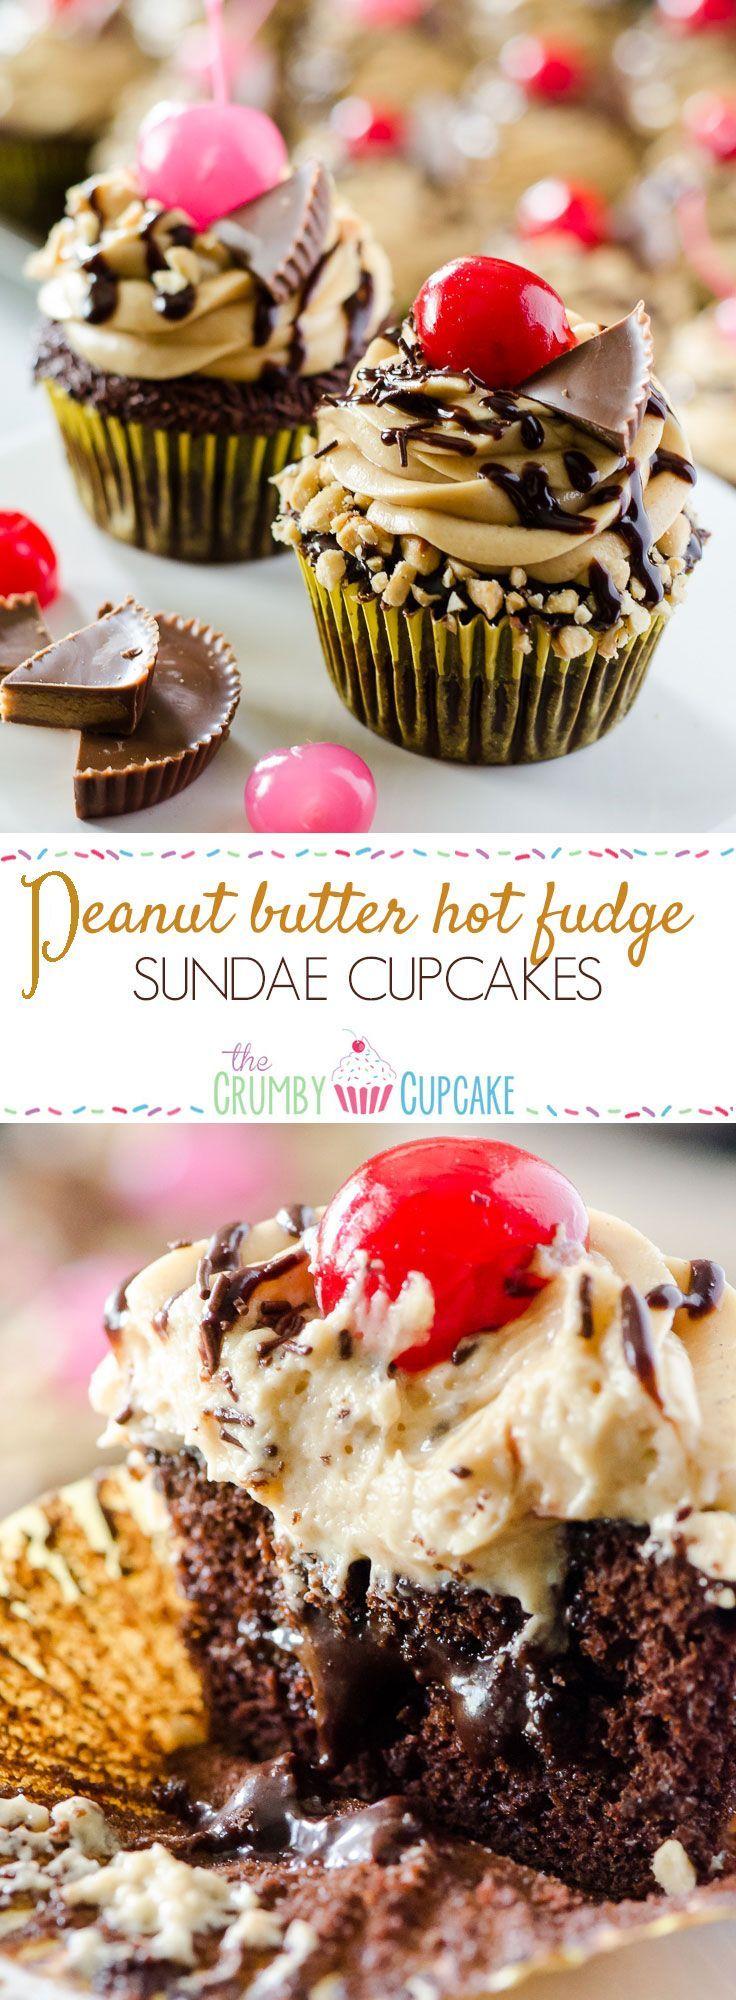 Peanut Butter Hot Fudge Sundae Cupcakes #christmasdesserts